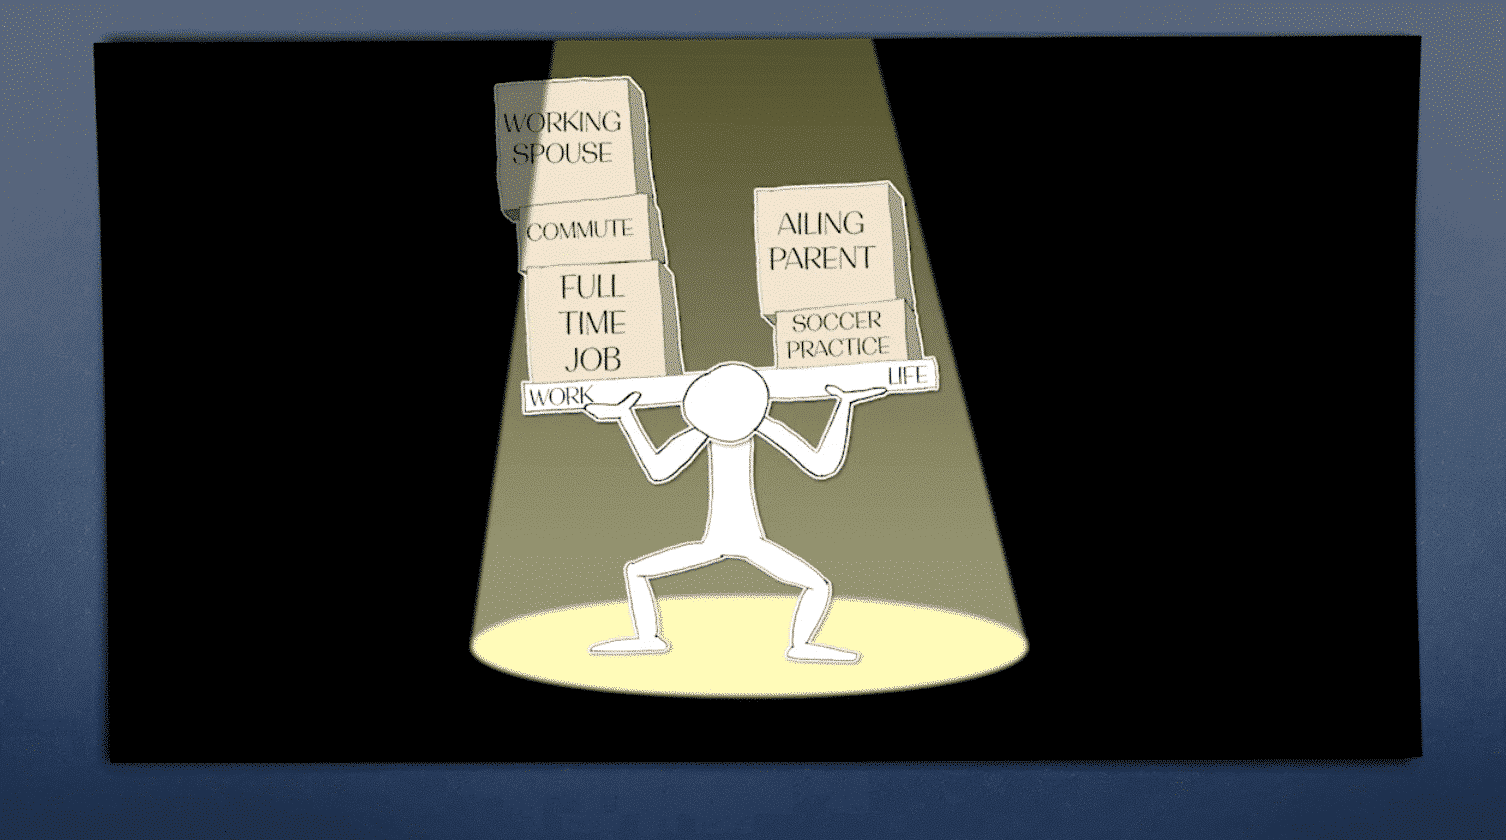 Leadership Workplace Flexibilty